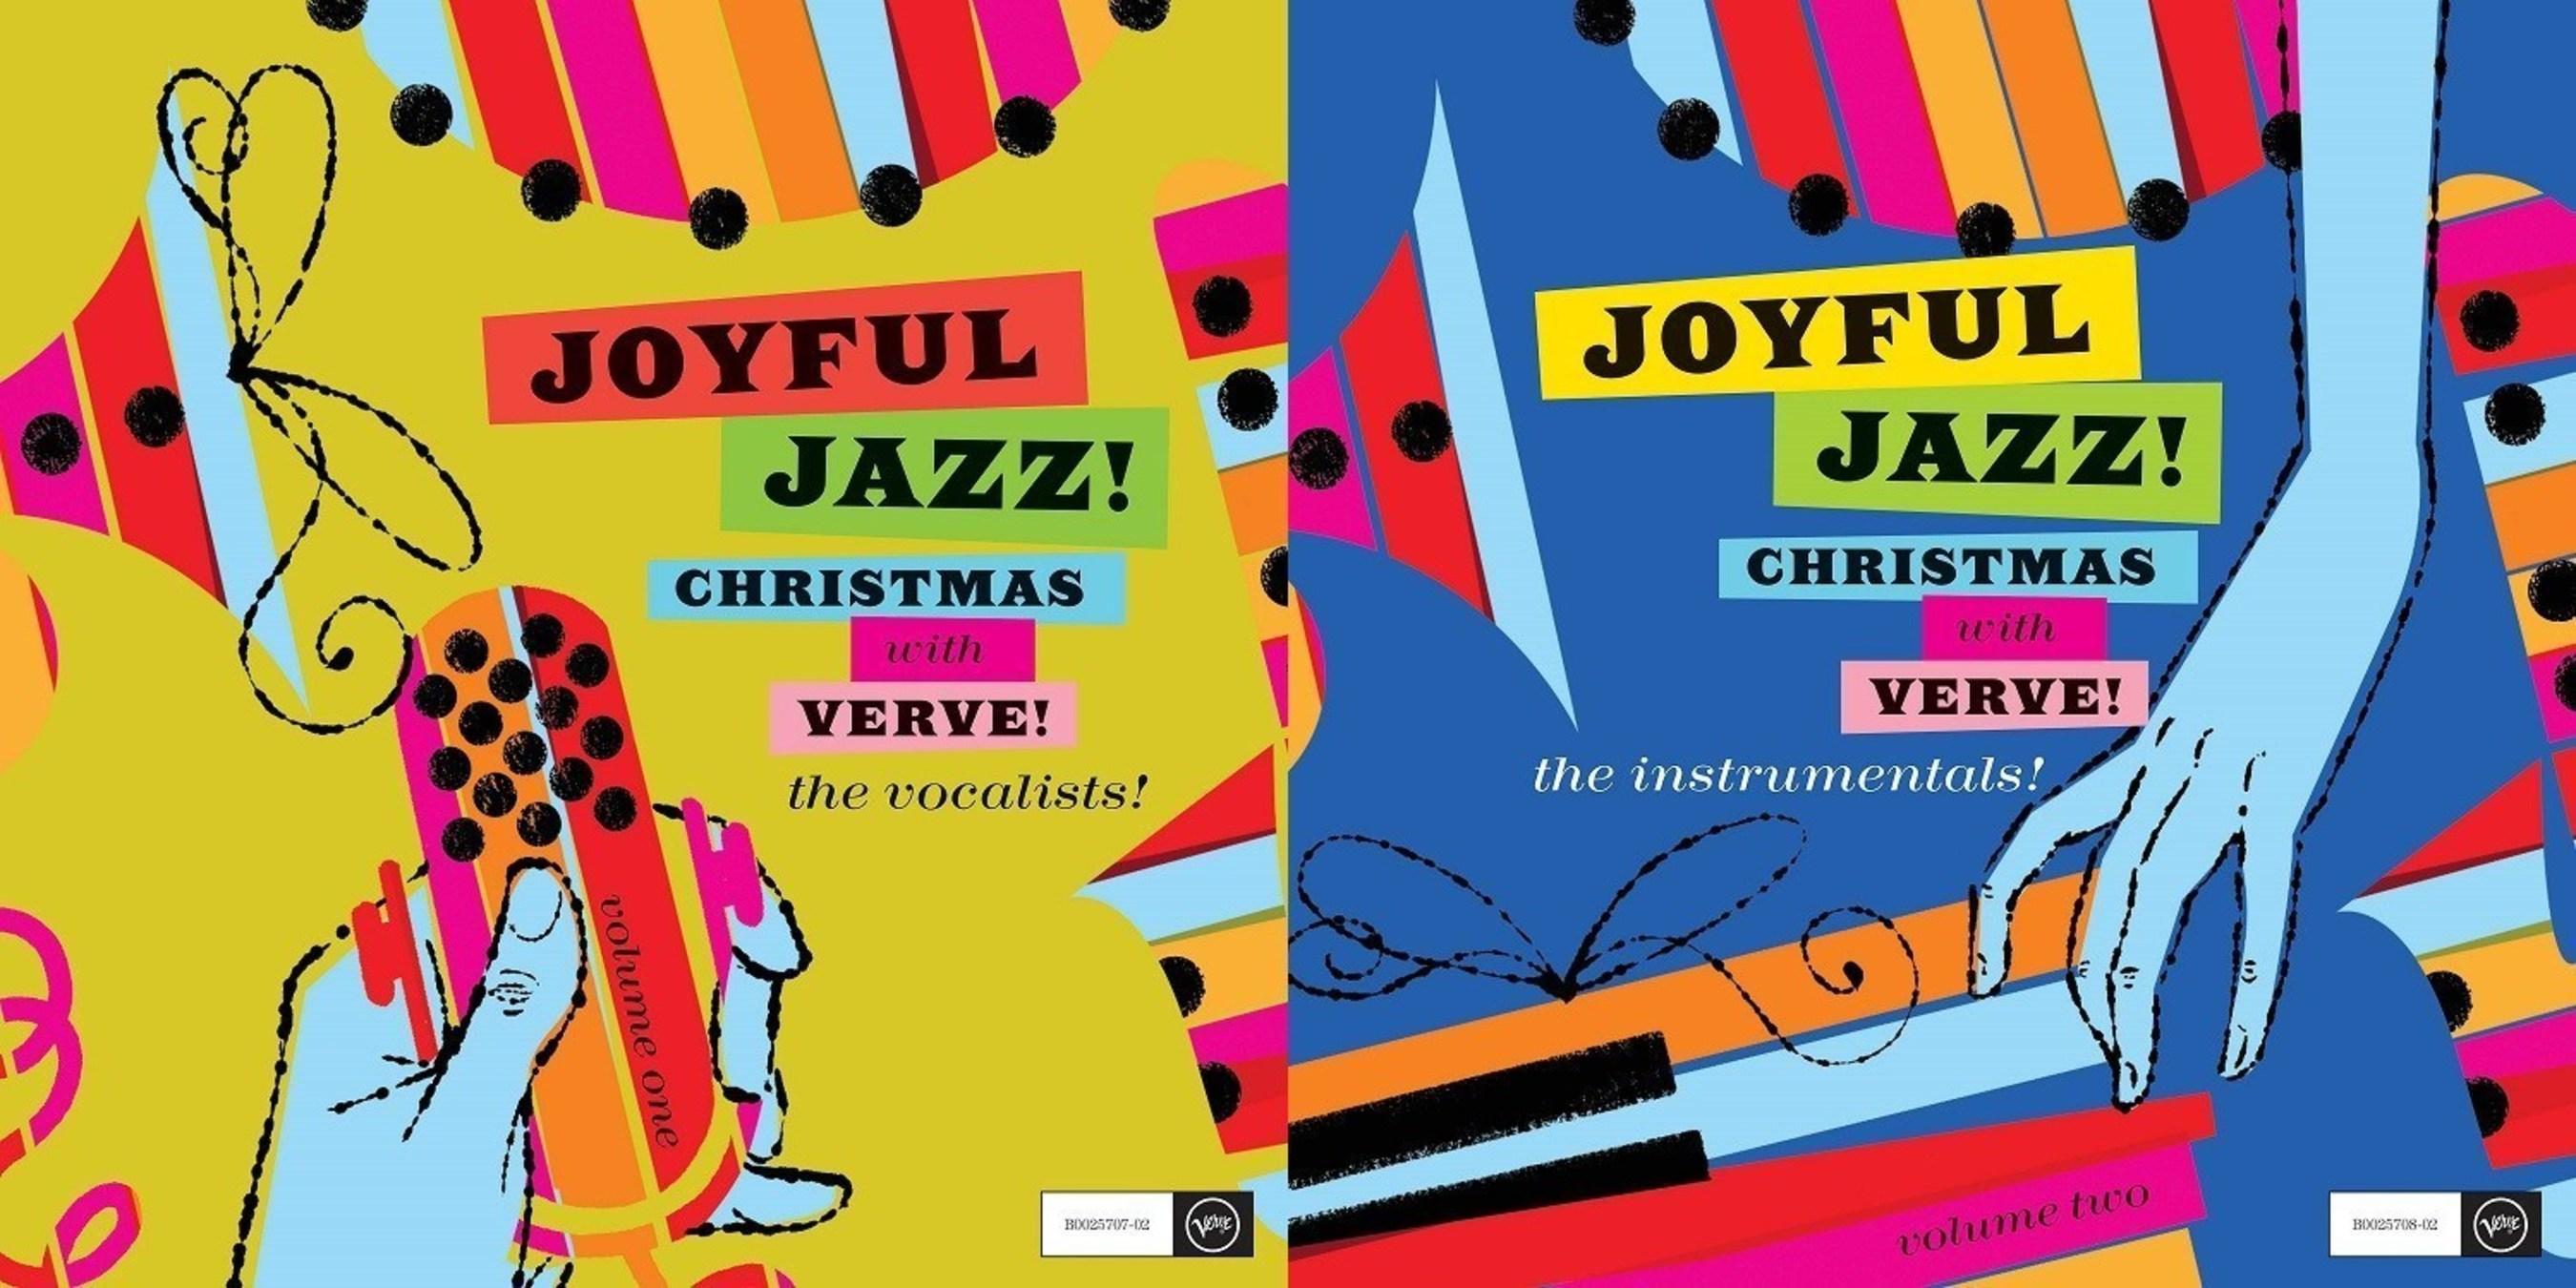 Verve Celebrates Christmas with Two Releases: Joyful Jazz! Christmas ...